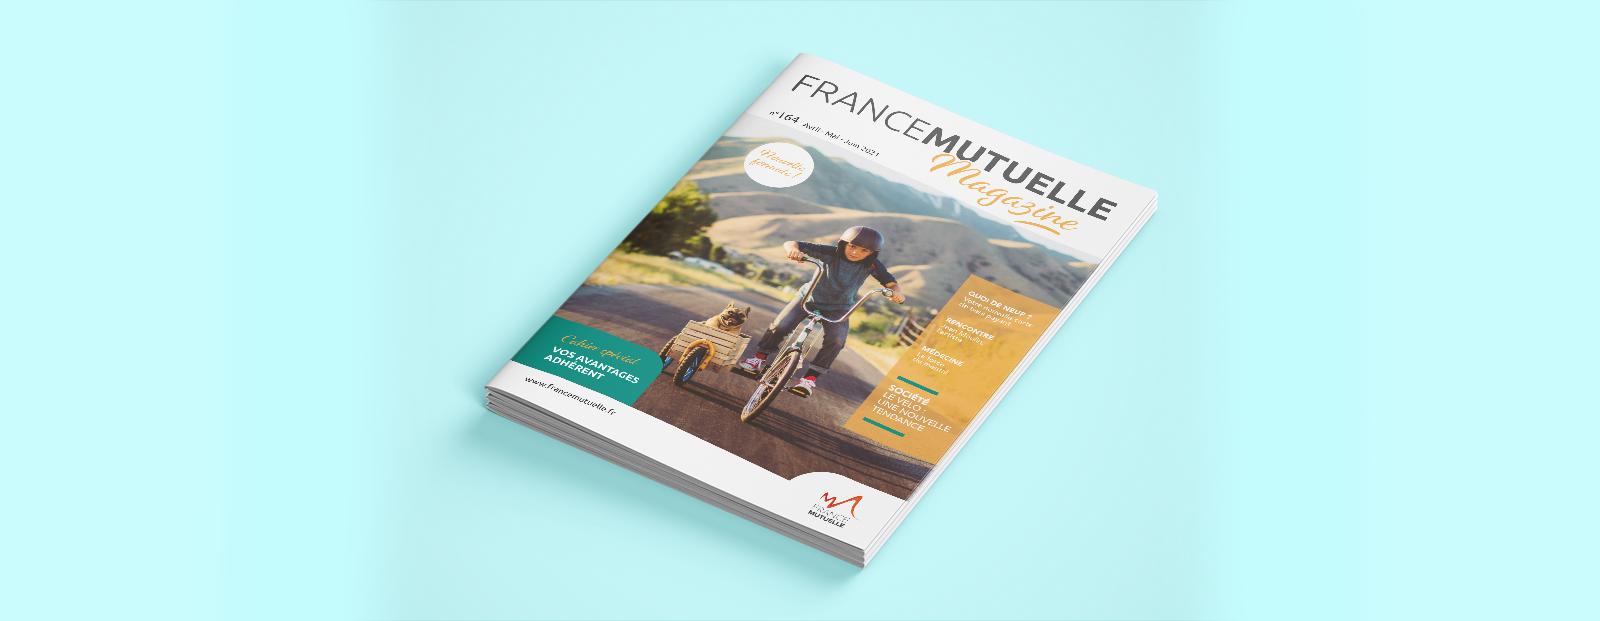 France Mutuelle Magazine